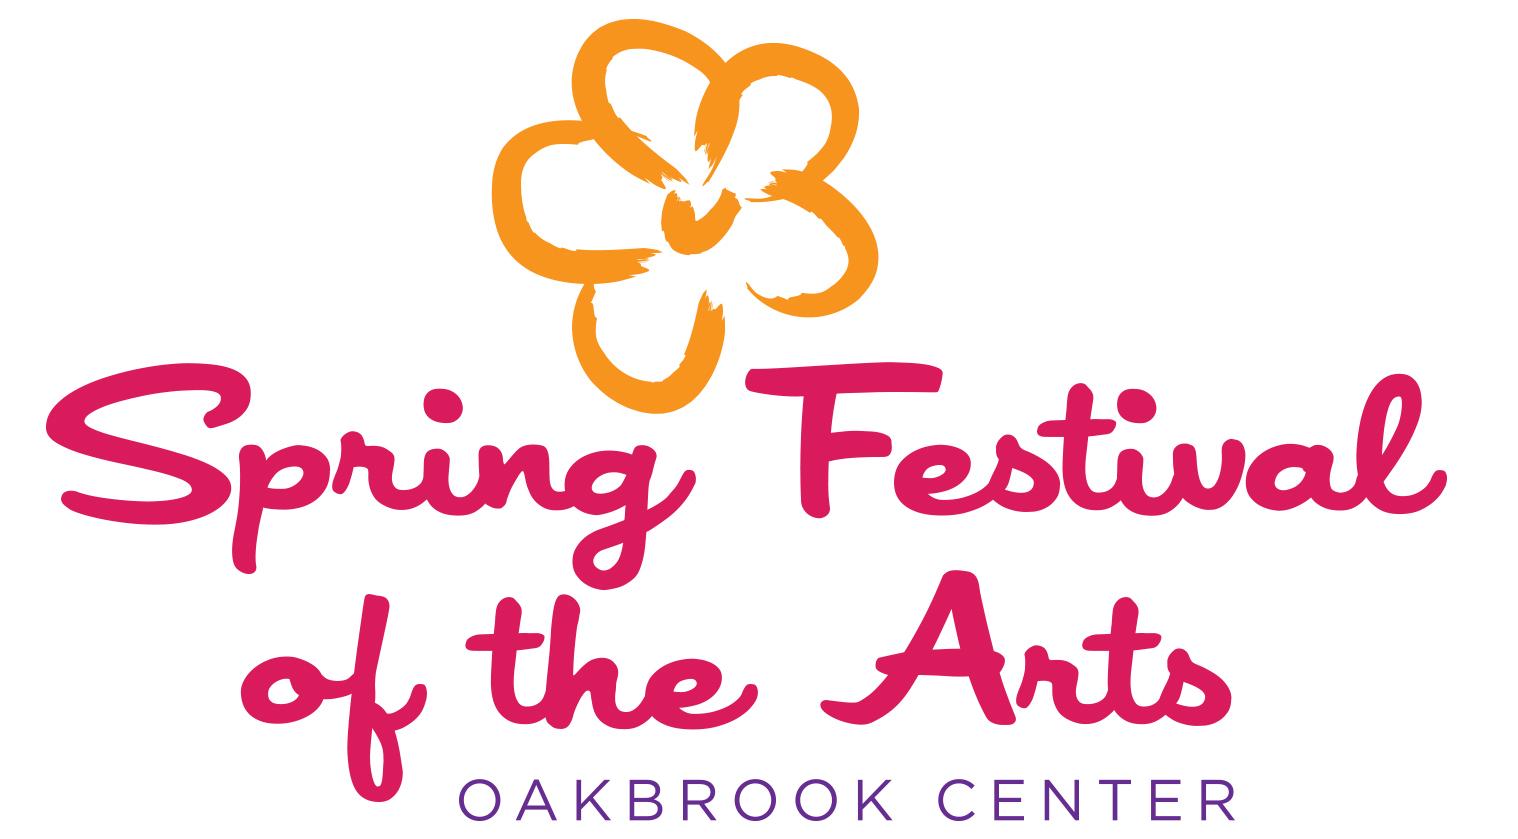 oak brook, oakbrook center festival,